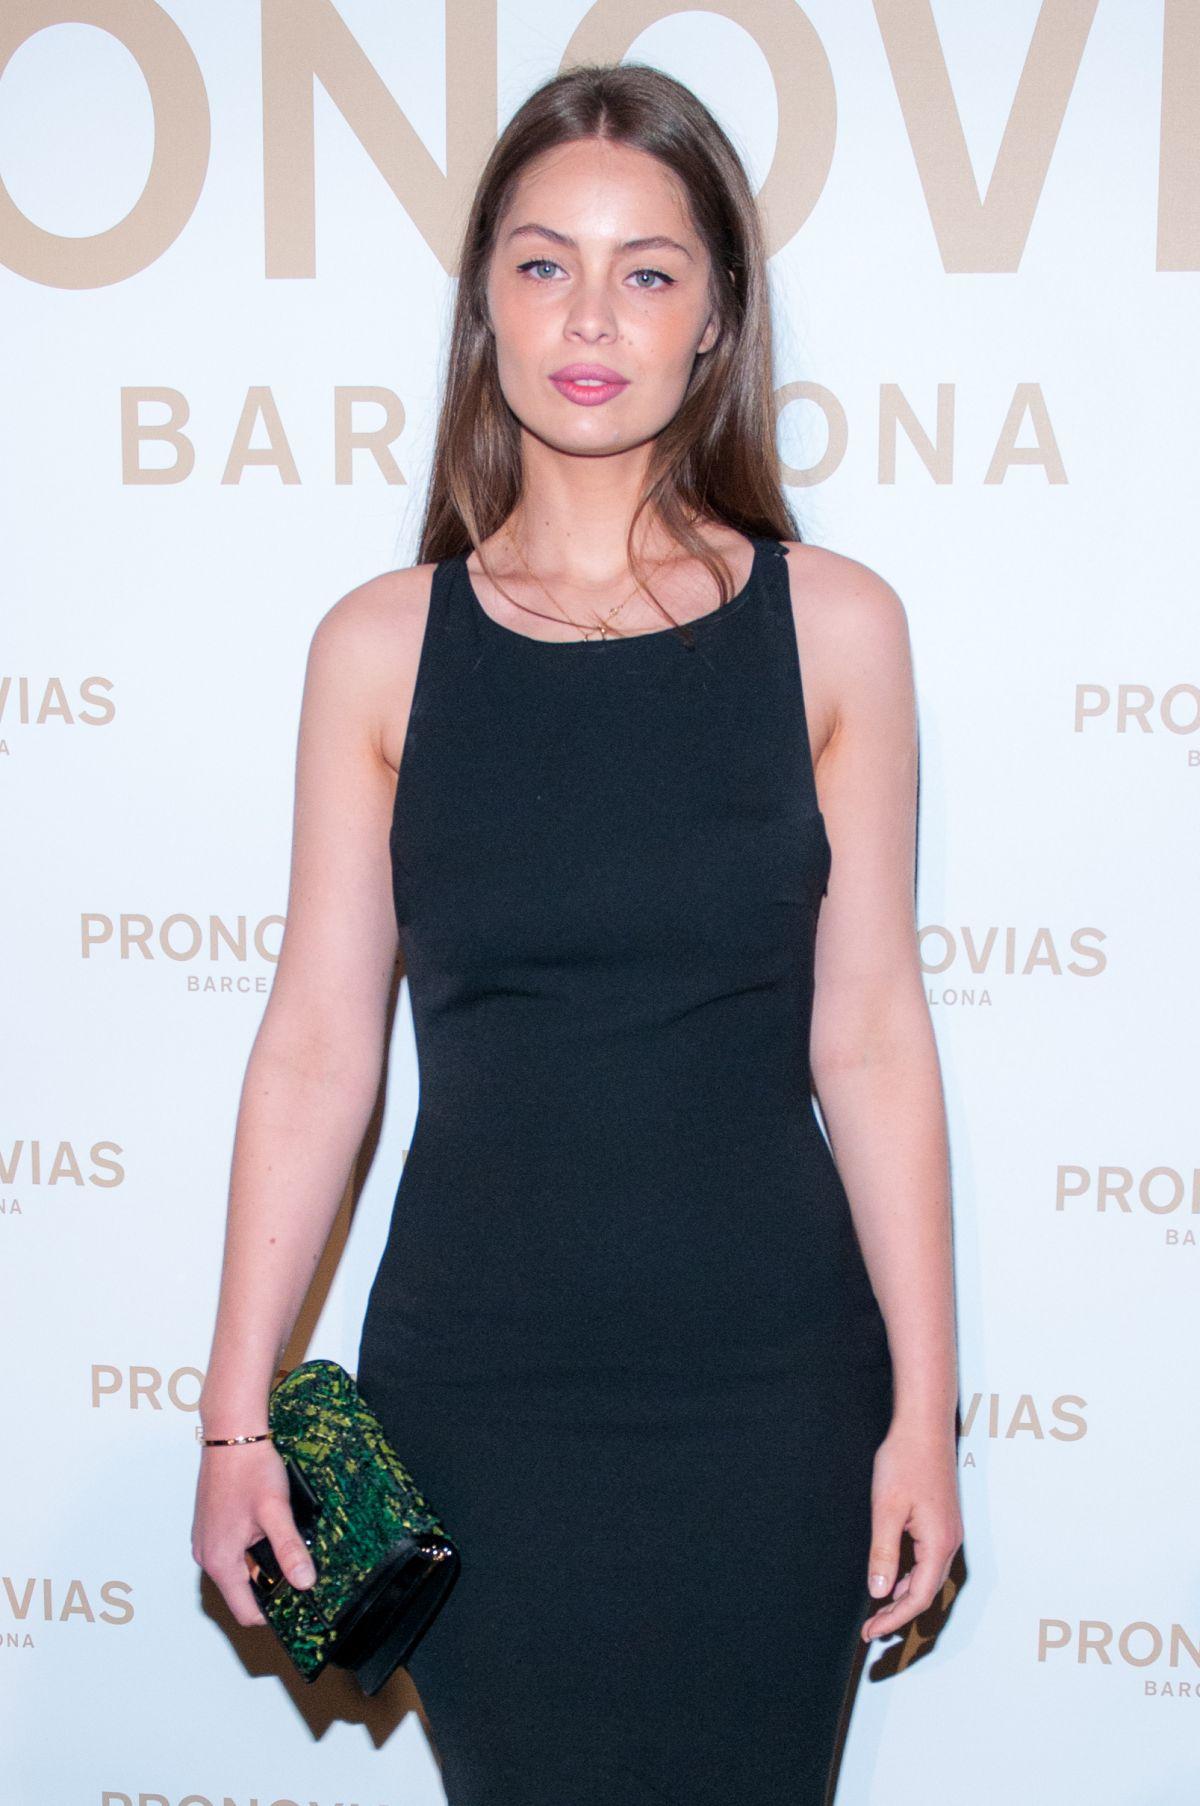 MARIE-ANGE CASTA at Barcelona Photocall at Pronovias Catwalk Show 04/28/2017